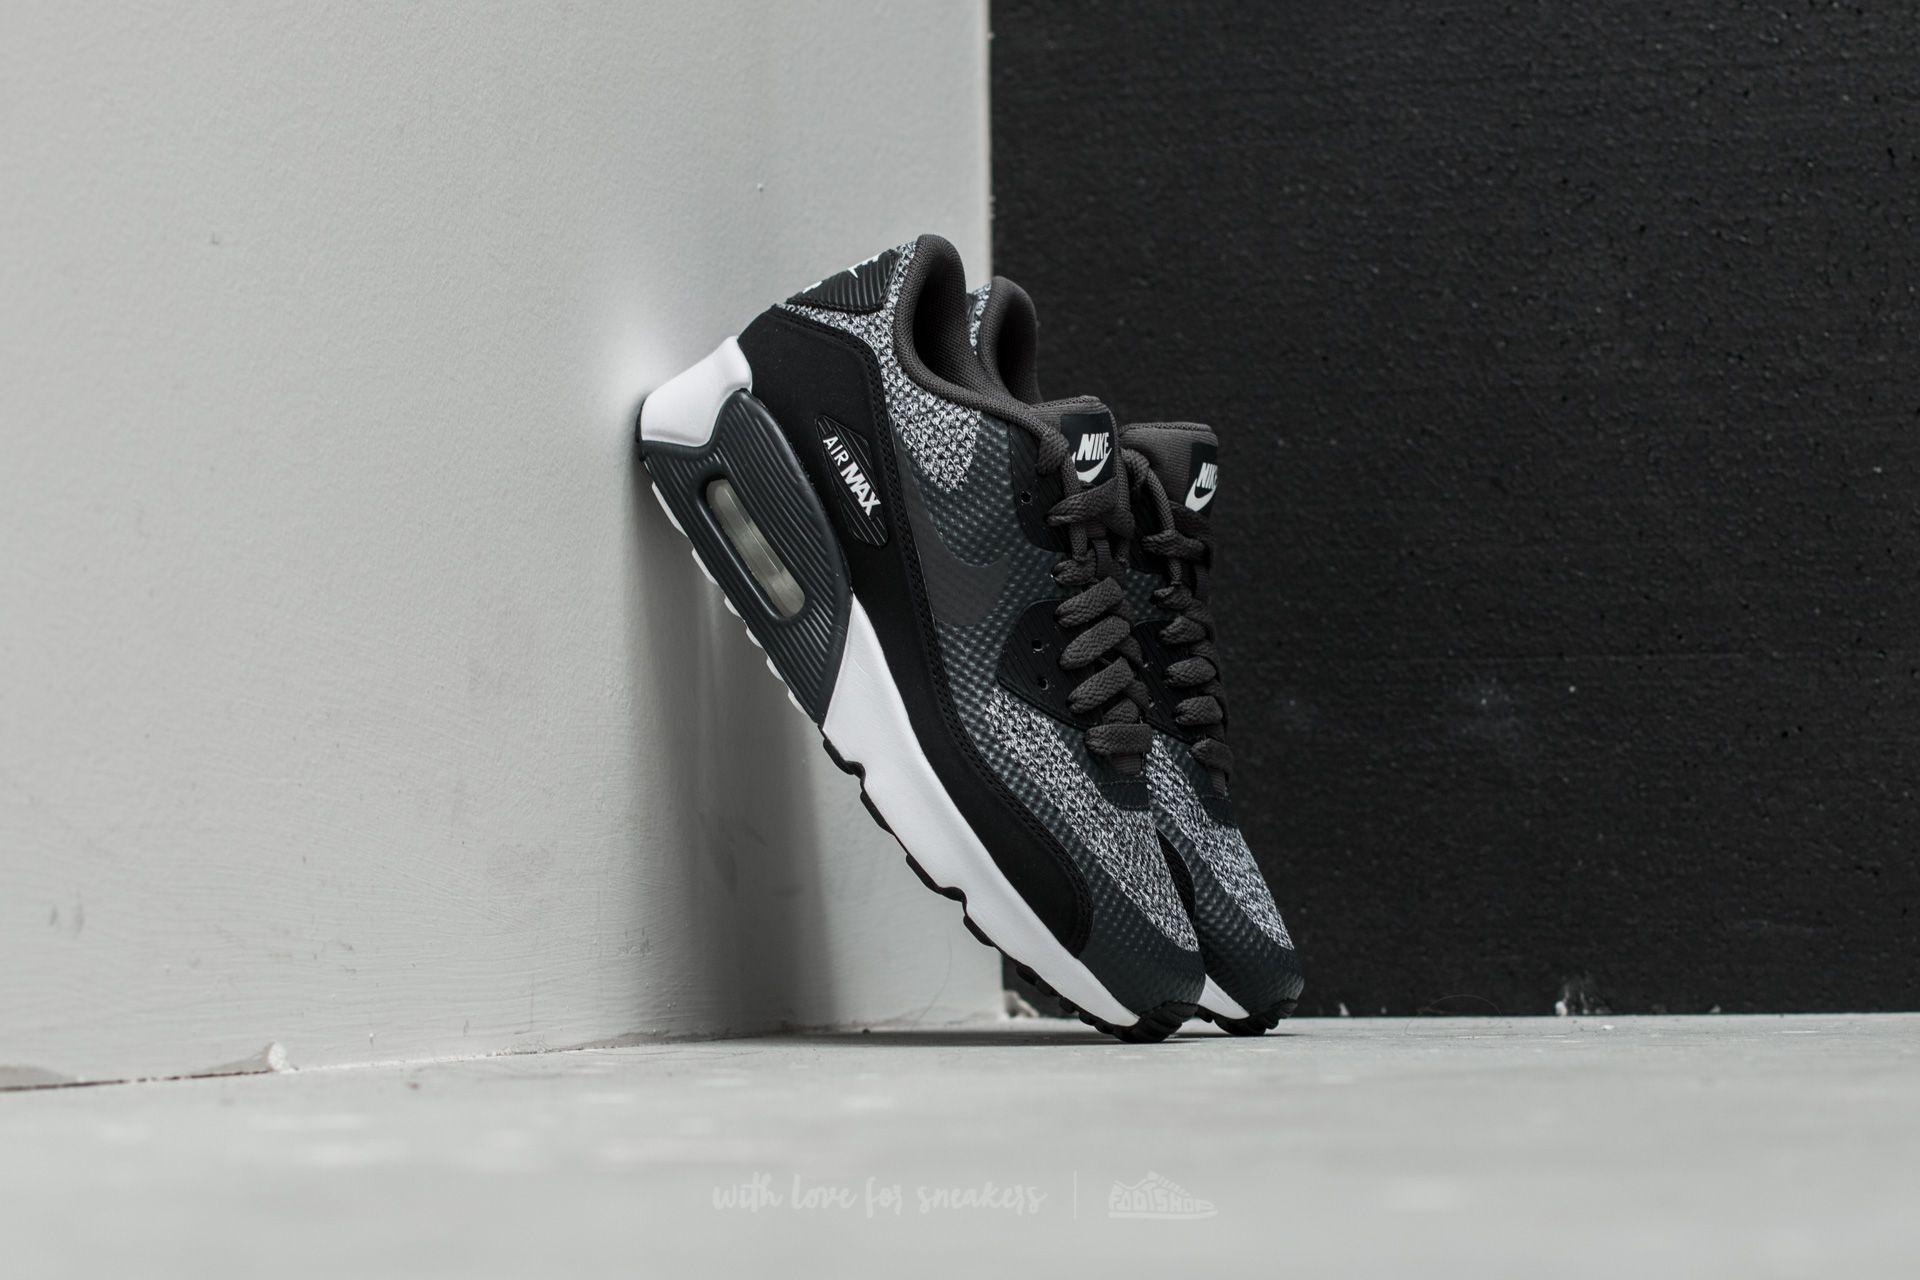 buy online 6984c 7b58d Nike Air Max 90 Ultra 2.0 SE (GS) Anthracite/ Black-White-White ...